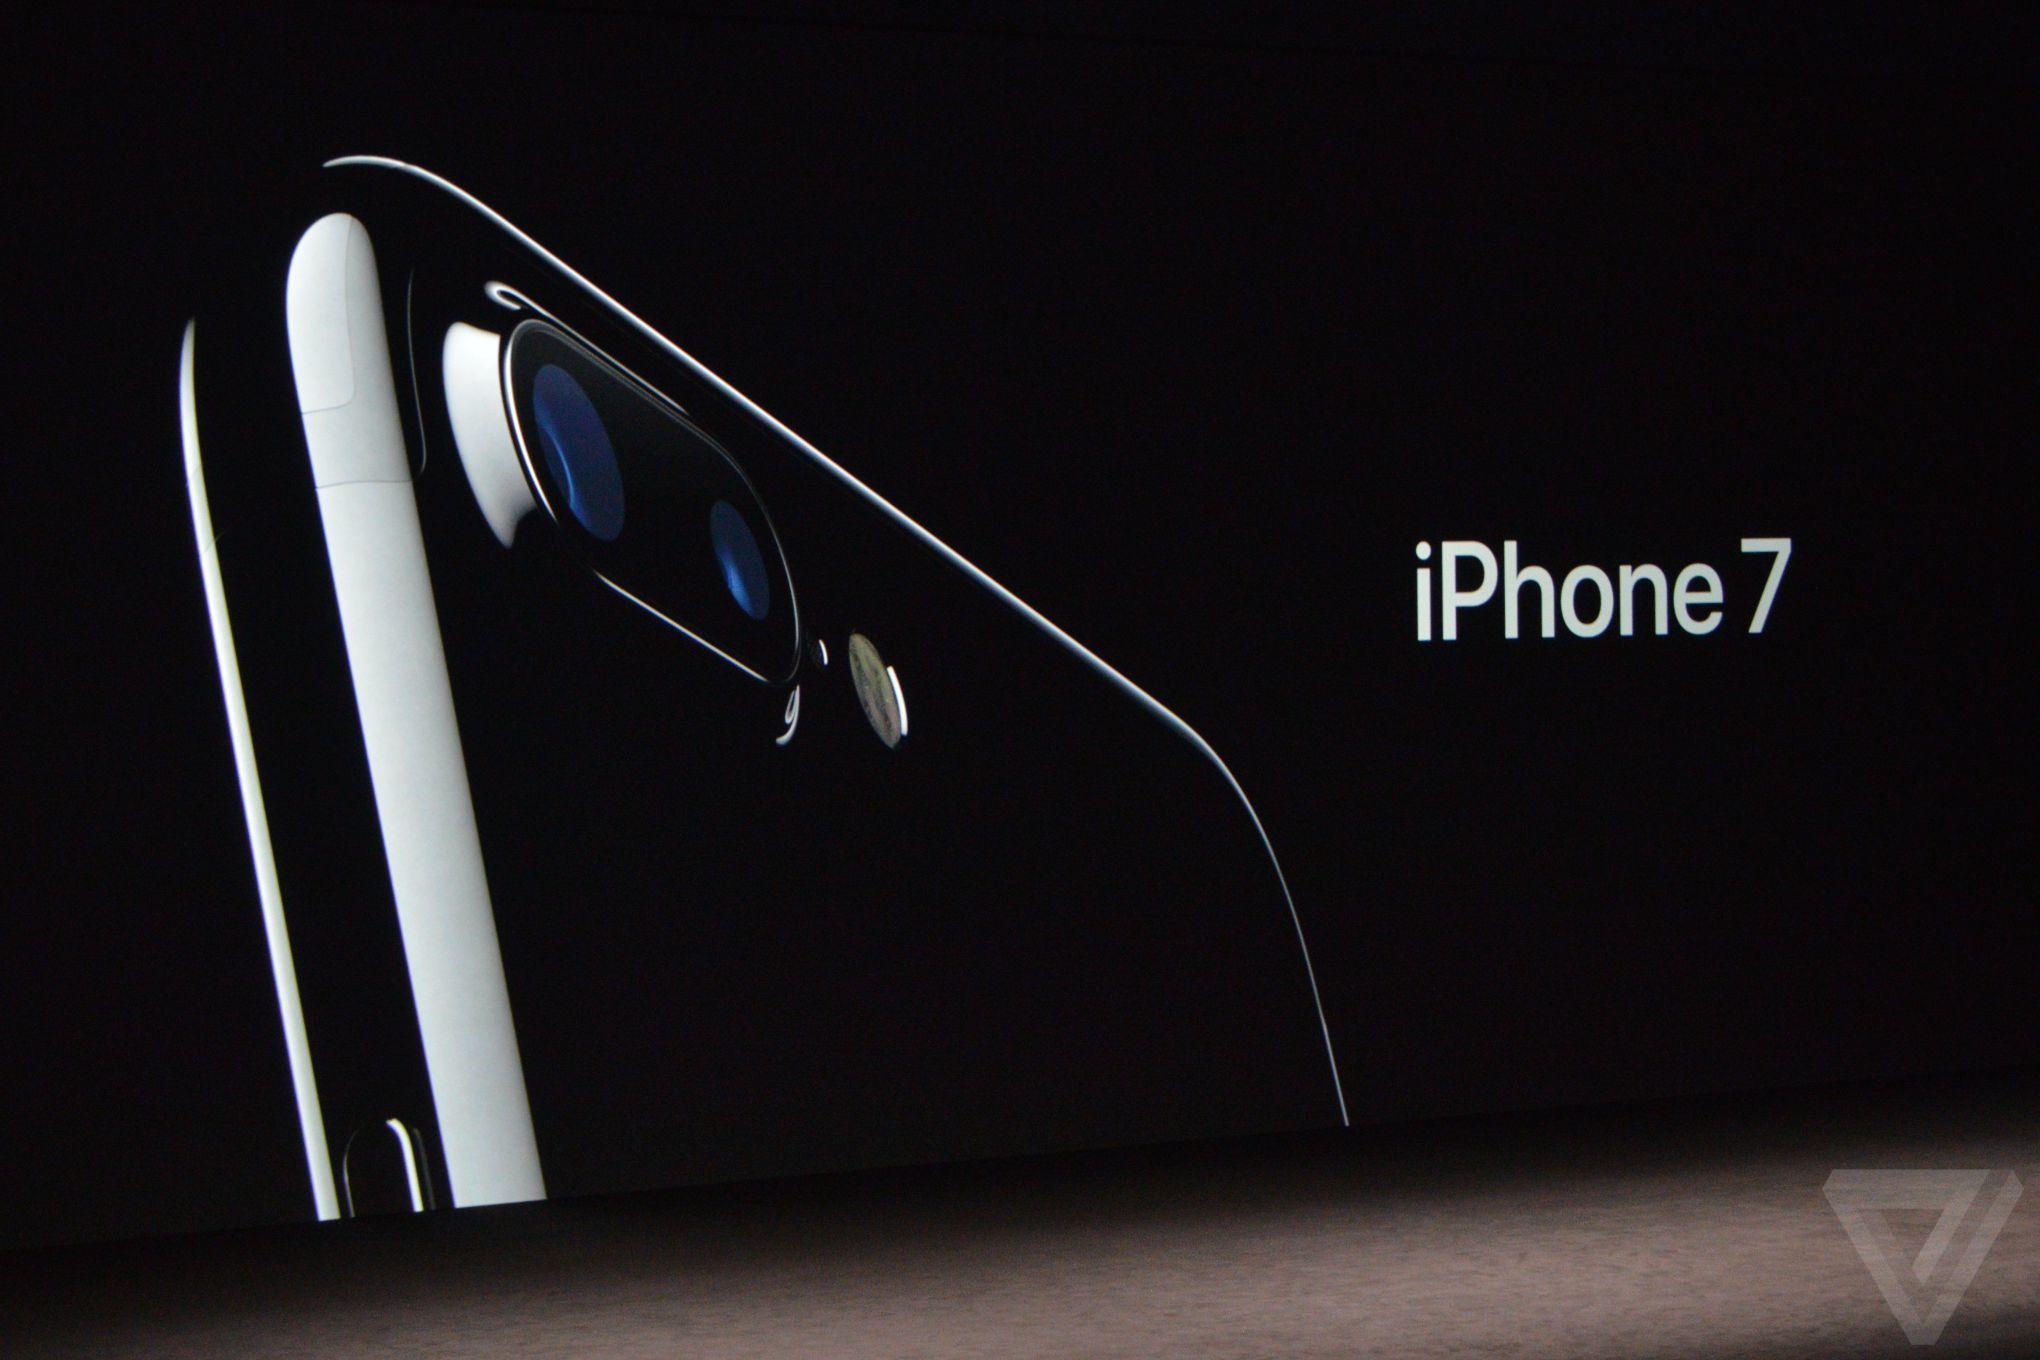 apple-iphone-watch-20160907-4624